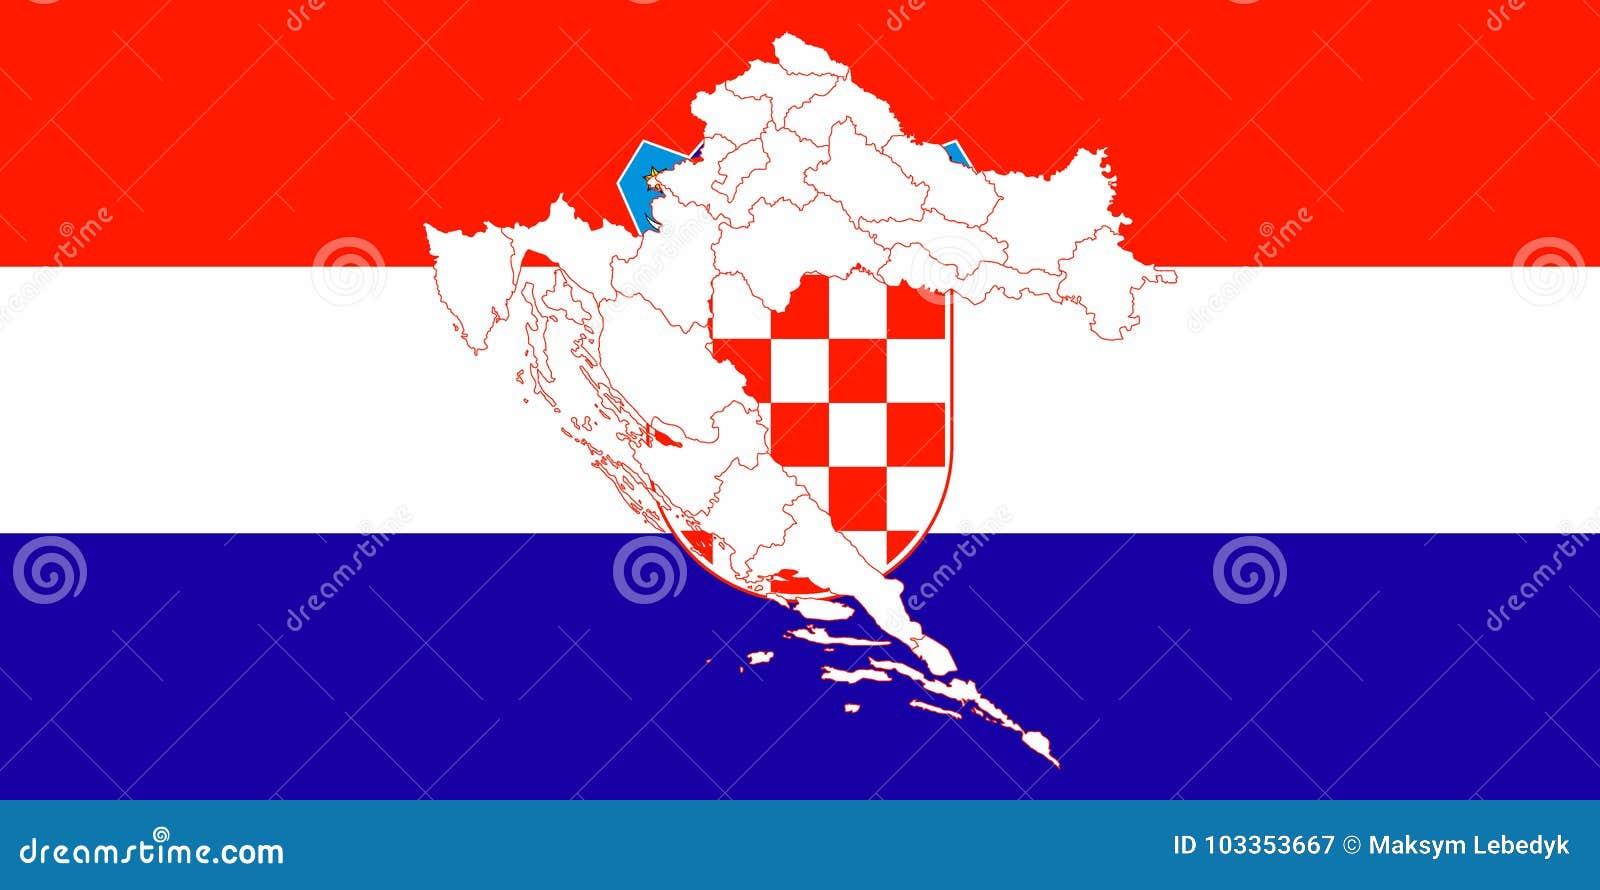 Map And Flag Of Croatia Stock Illustration Illustration Of City